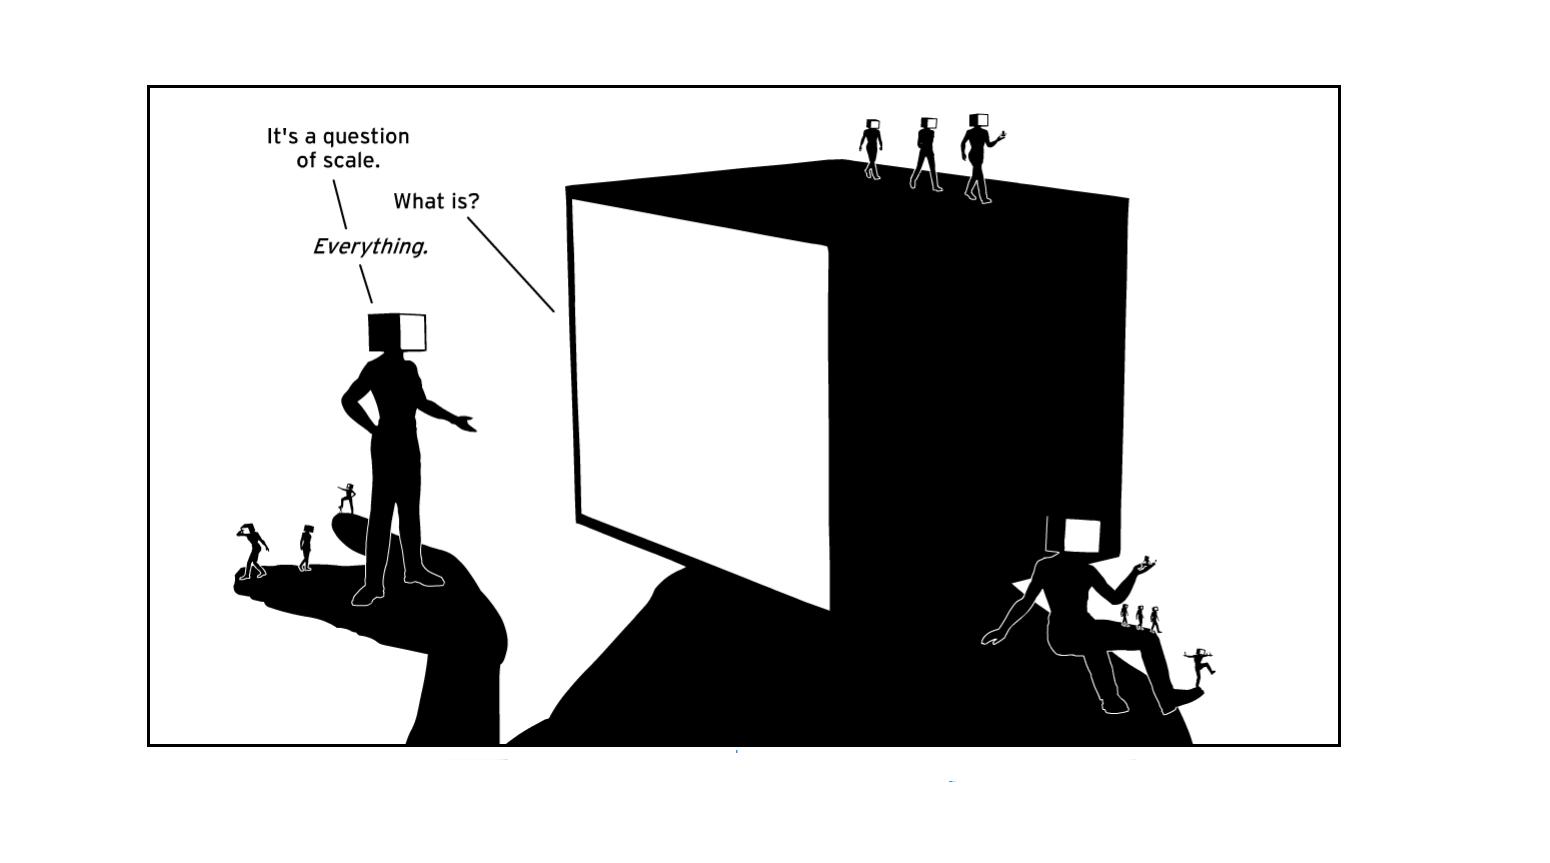 Interactive Infinite Canvas Webcomics by Daniel Goodbrey